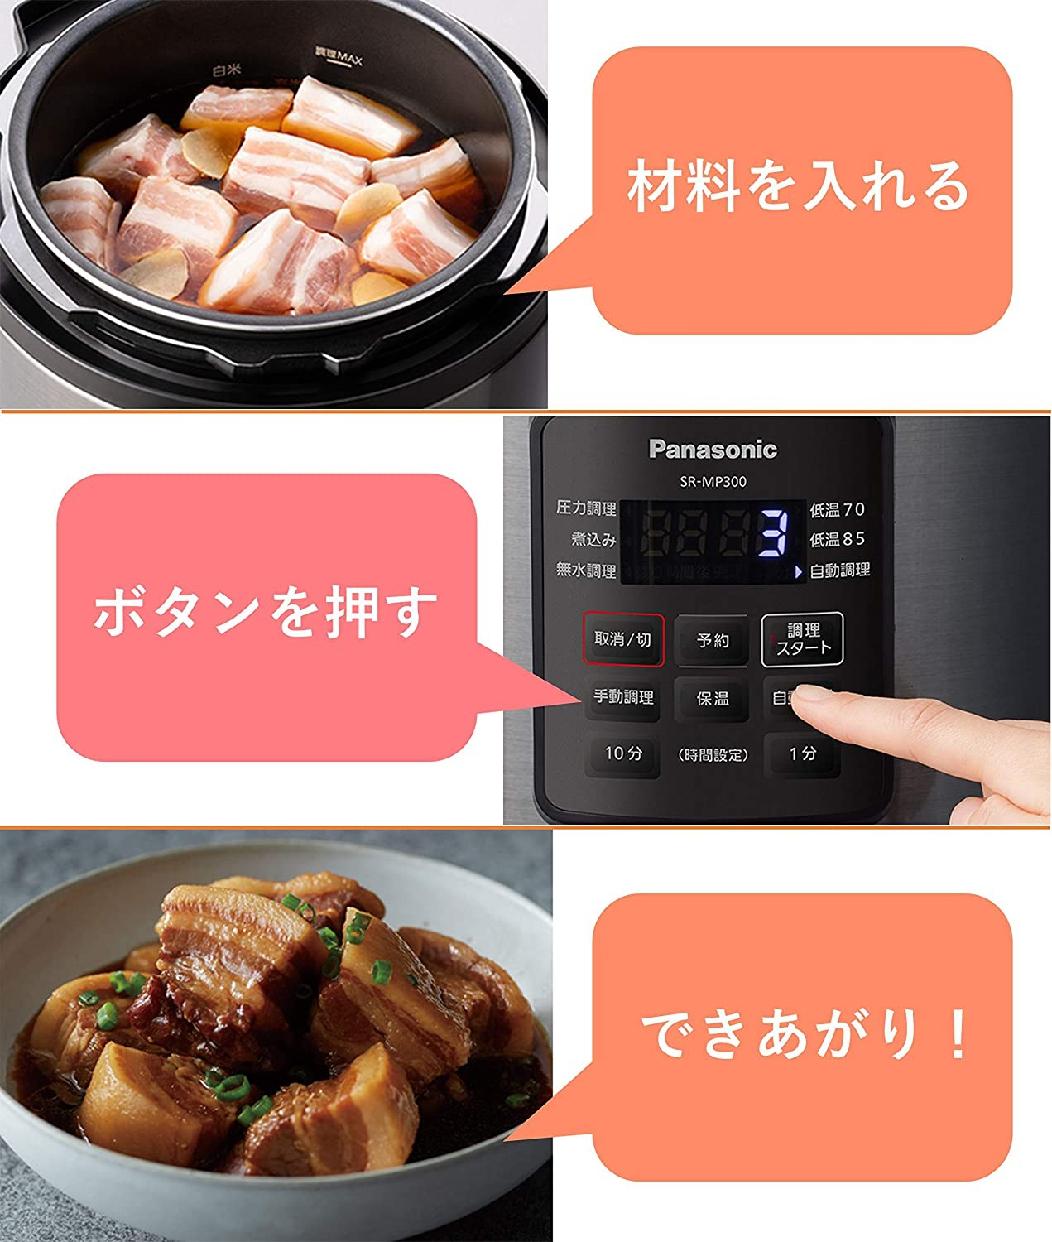 Panasonic(パナソニック) 電気圧力なべ ブラック SR-MP300-Kの商品画像4